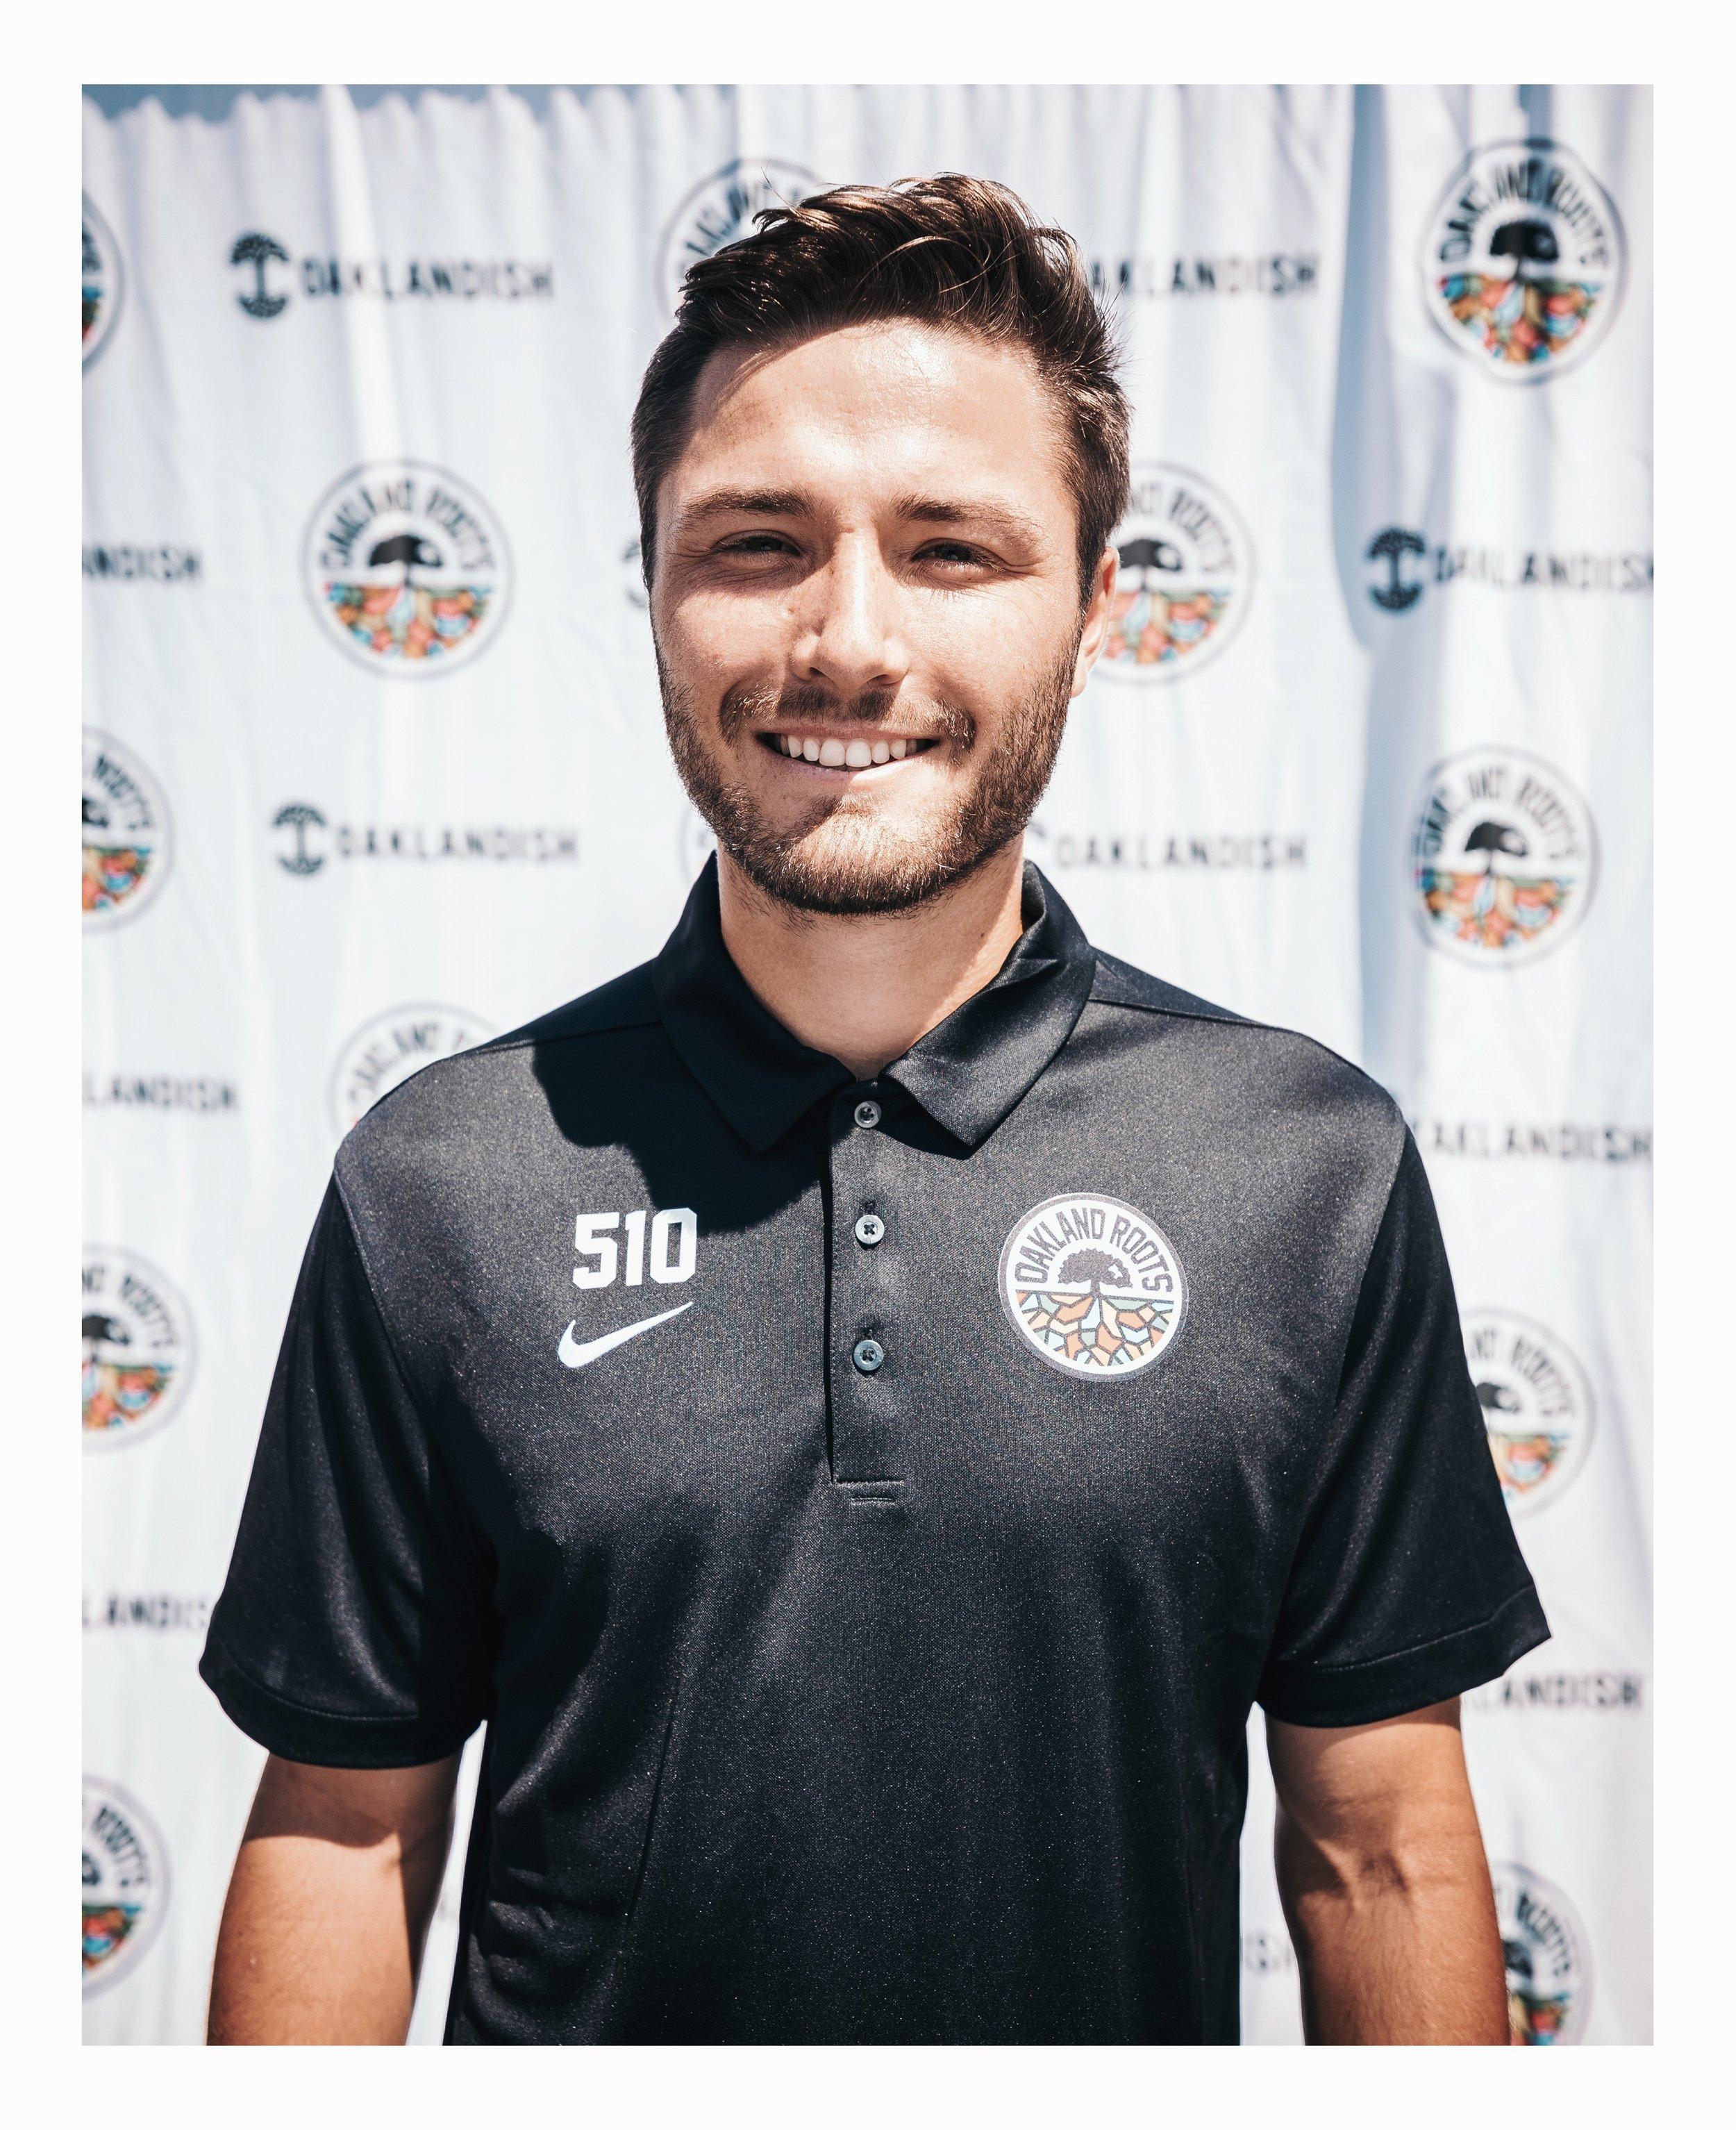 Ryan Masch #21 - Central Mdifielder